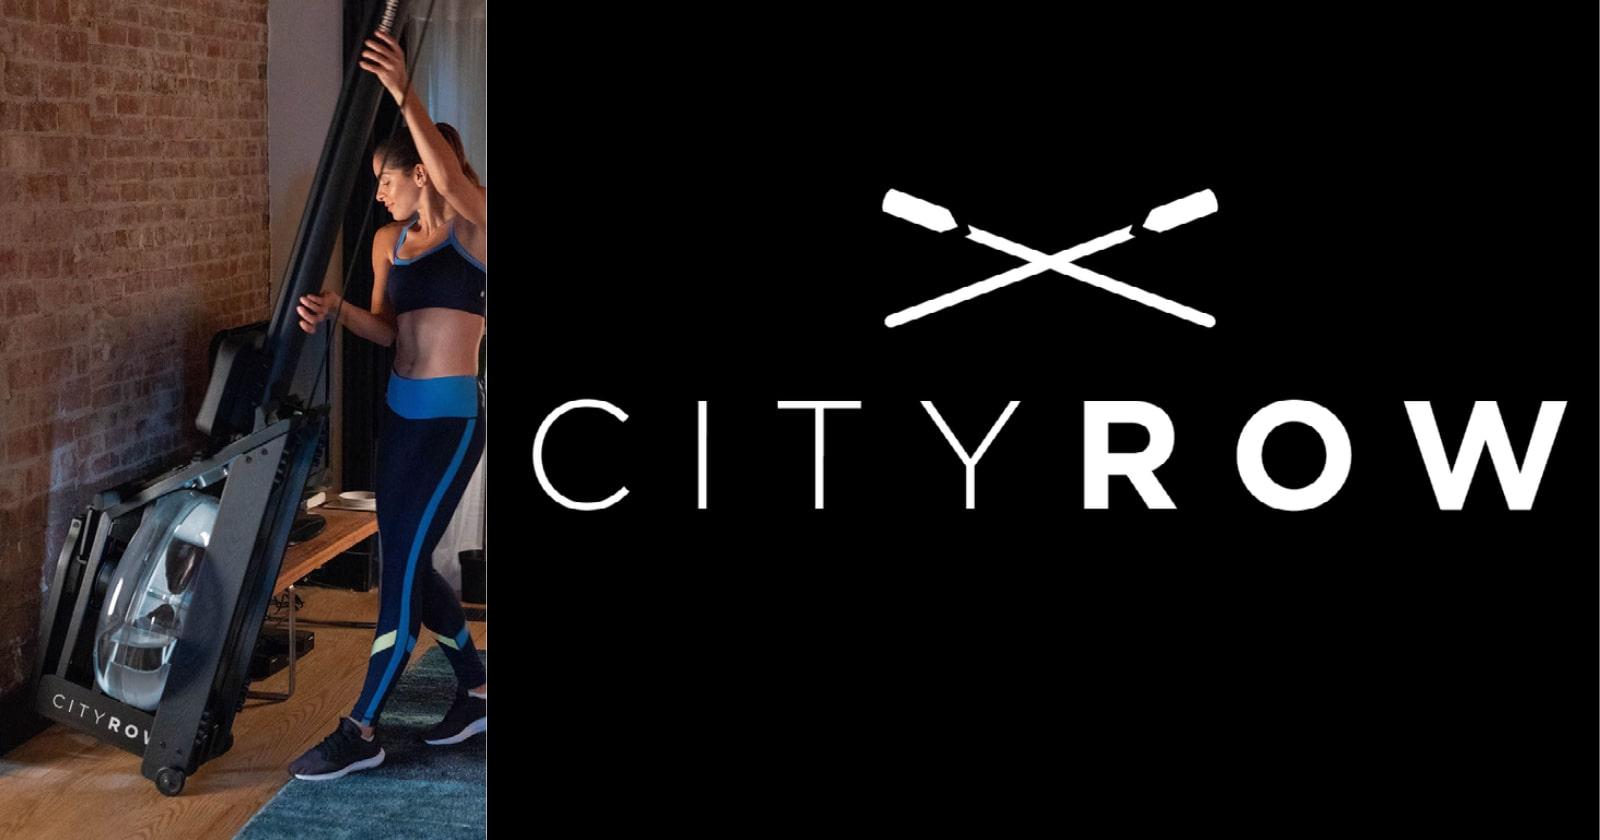 woman wheeling cityrow go rower and brand logo